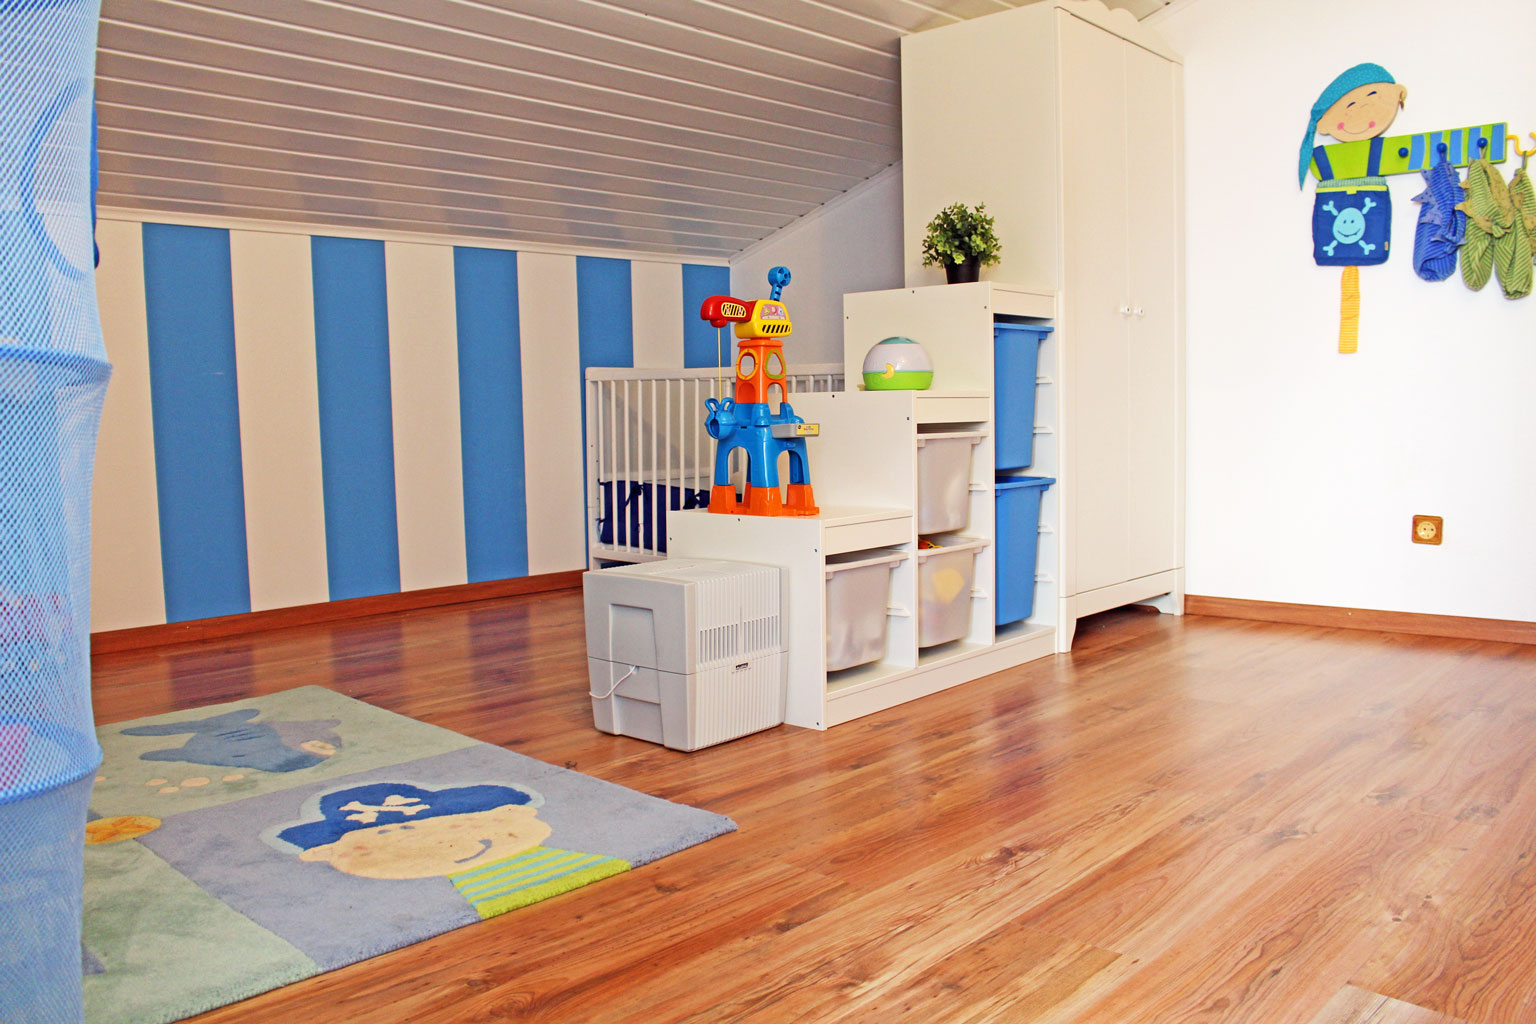 venta luftreiniger lw25 mama testblog. Black Bedroom Furniture Sets. Home Design Ideas